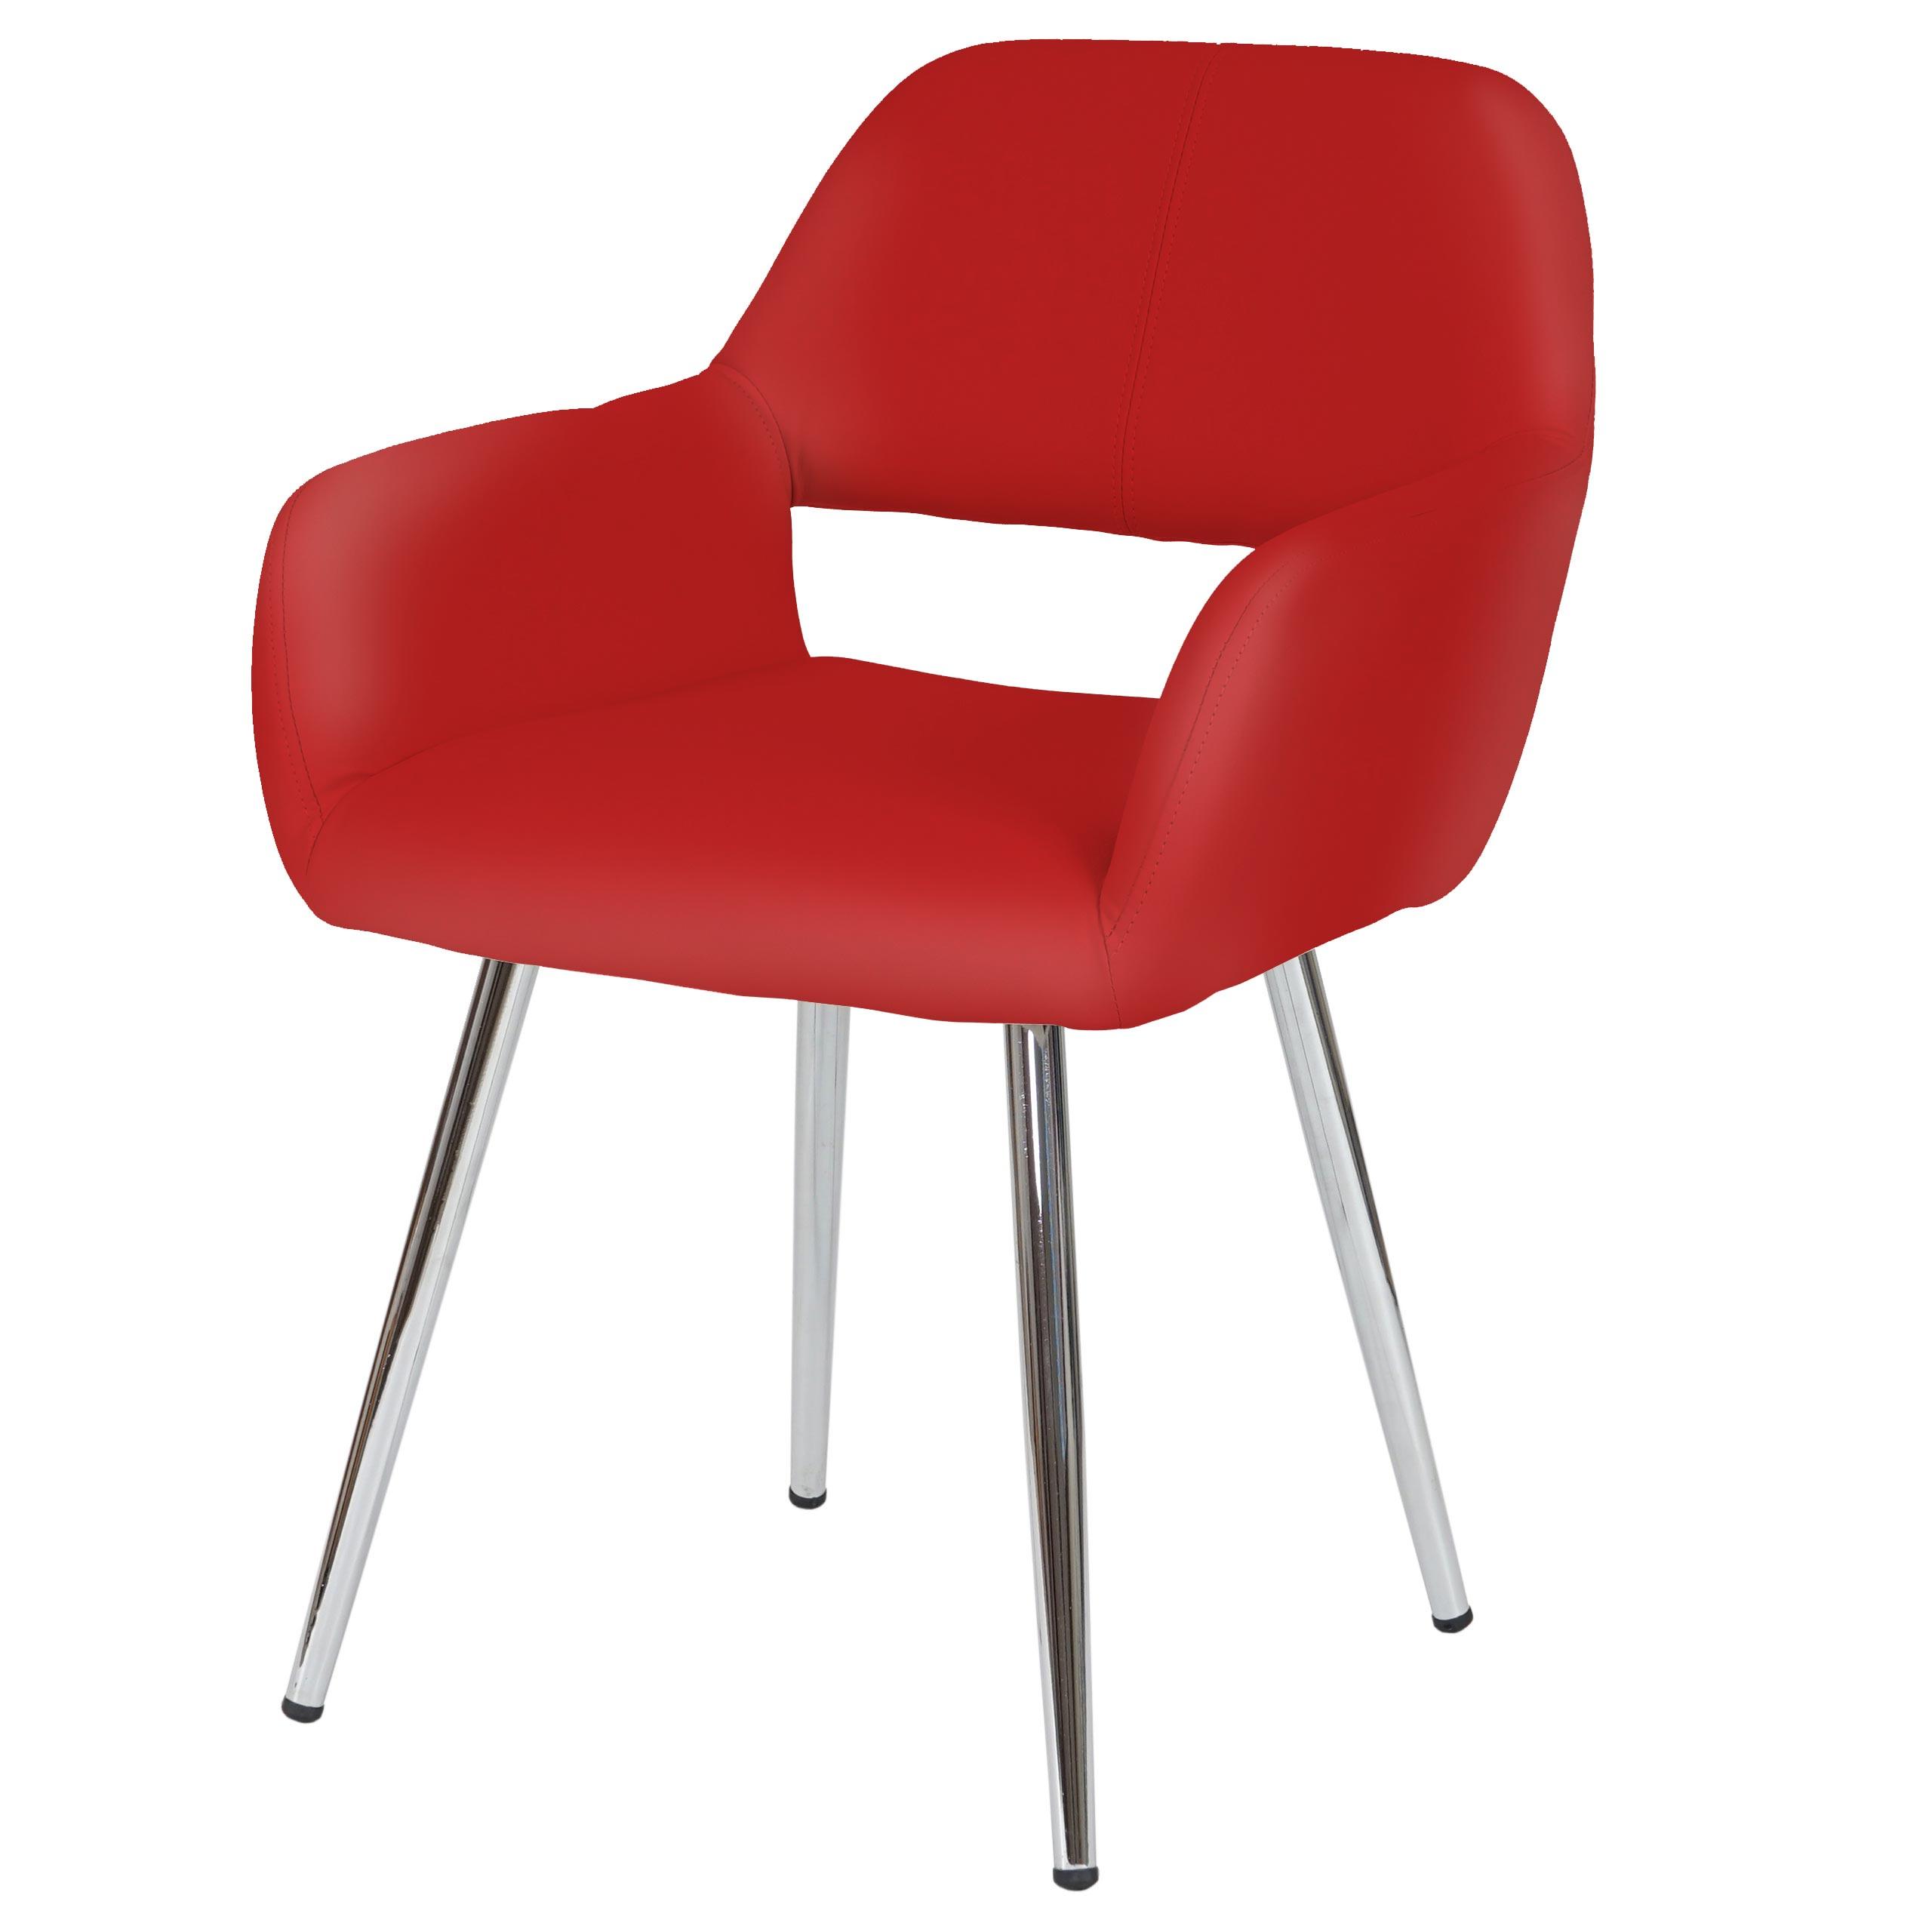 esszimmerstuhl altena stuhl lehnstuhl retro design. Black Bedroom Furniture Sets. Home Design Ideas